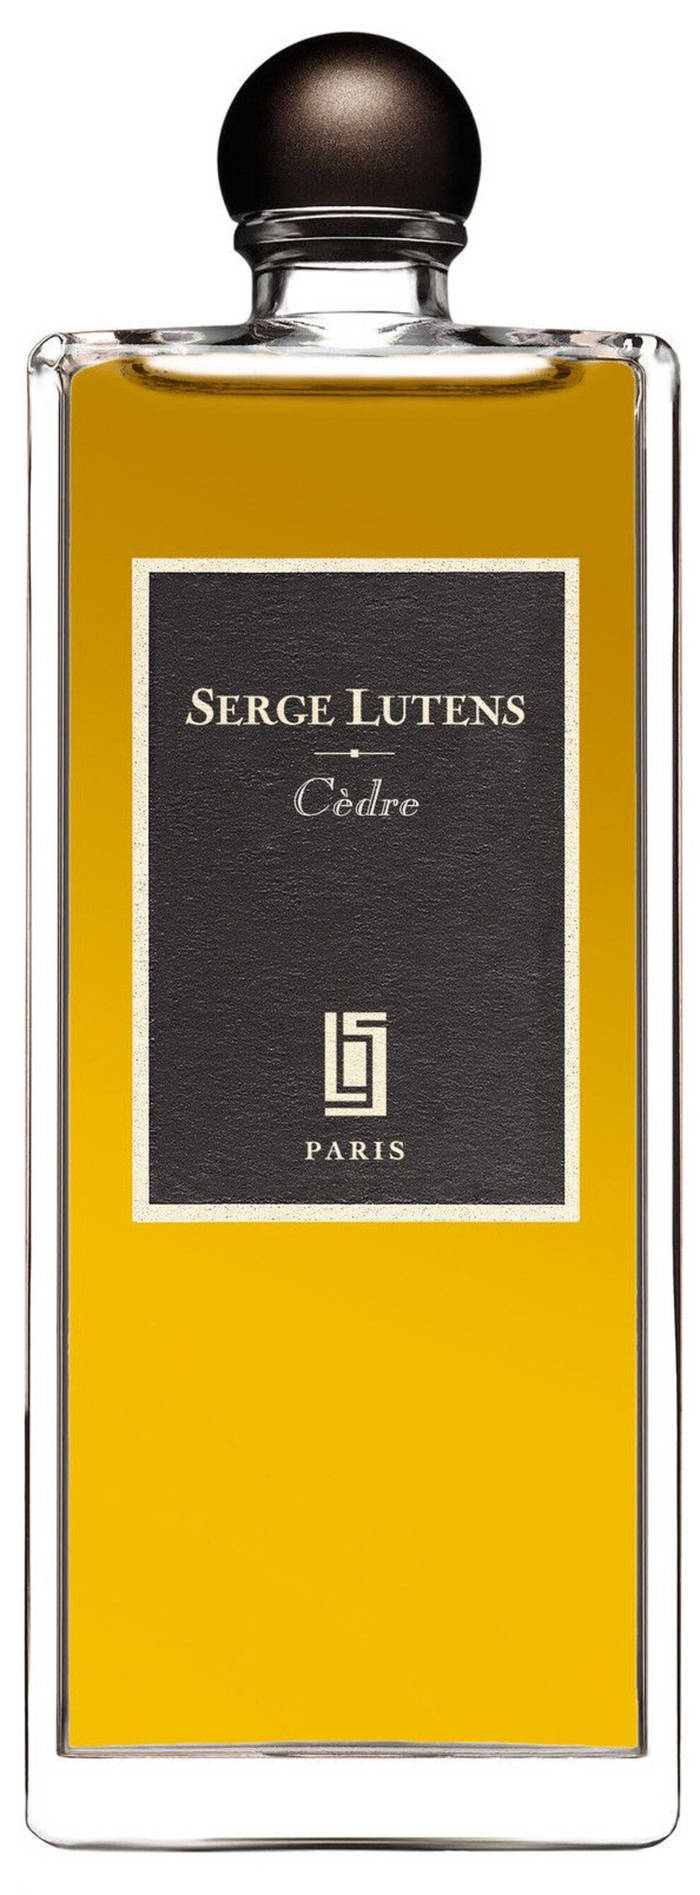 Cedre, Serge Lutens